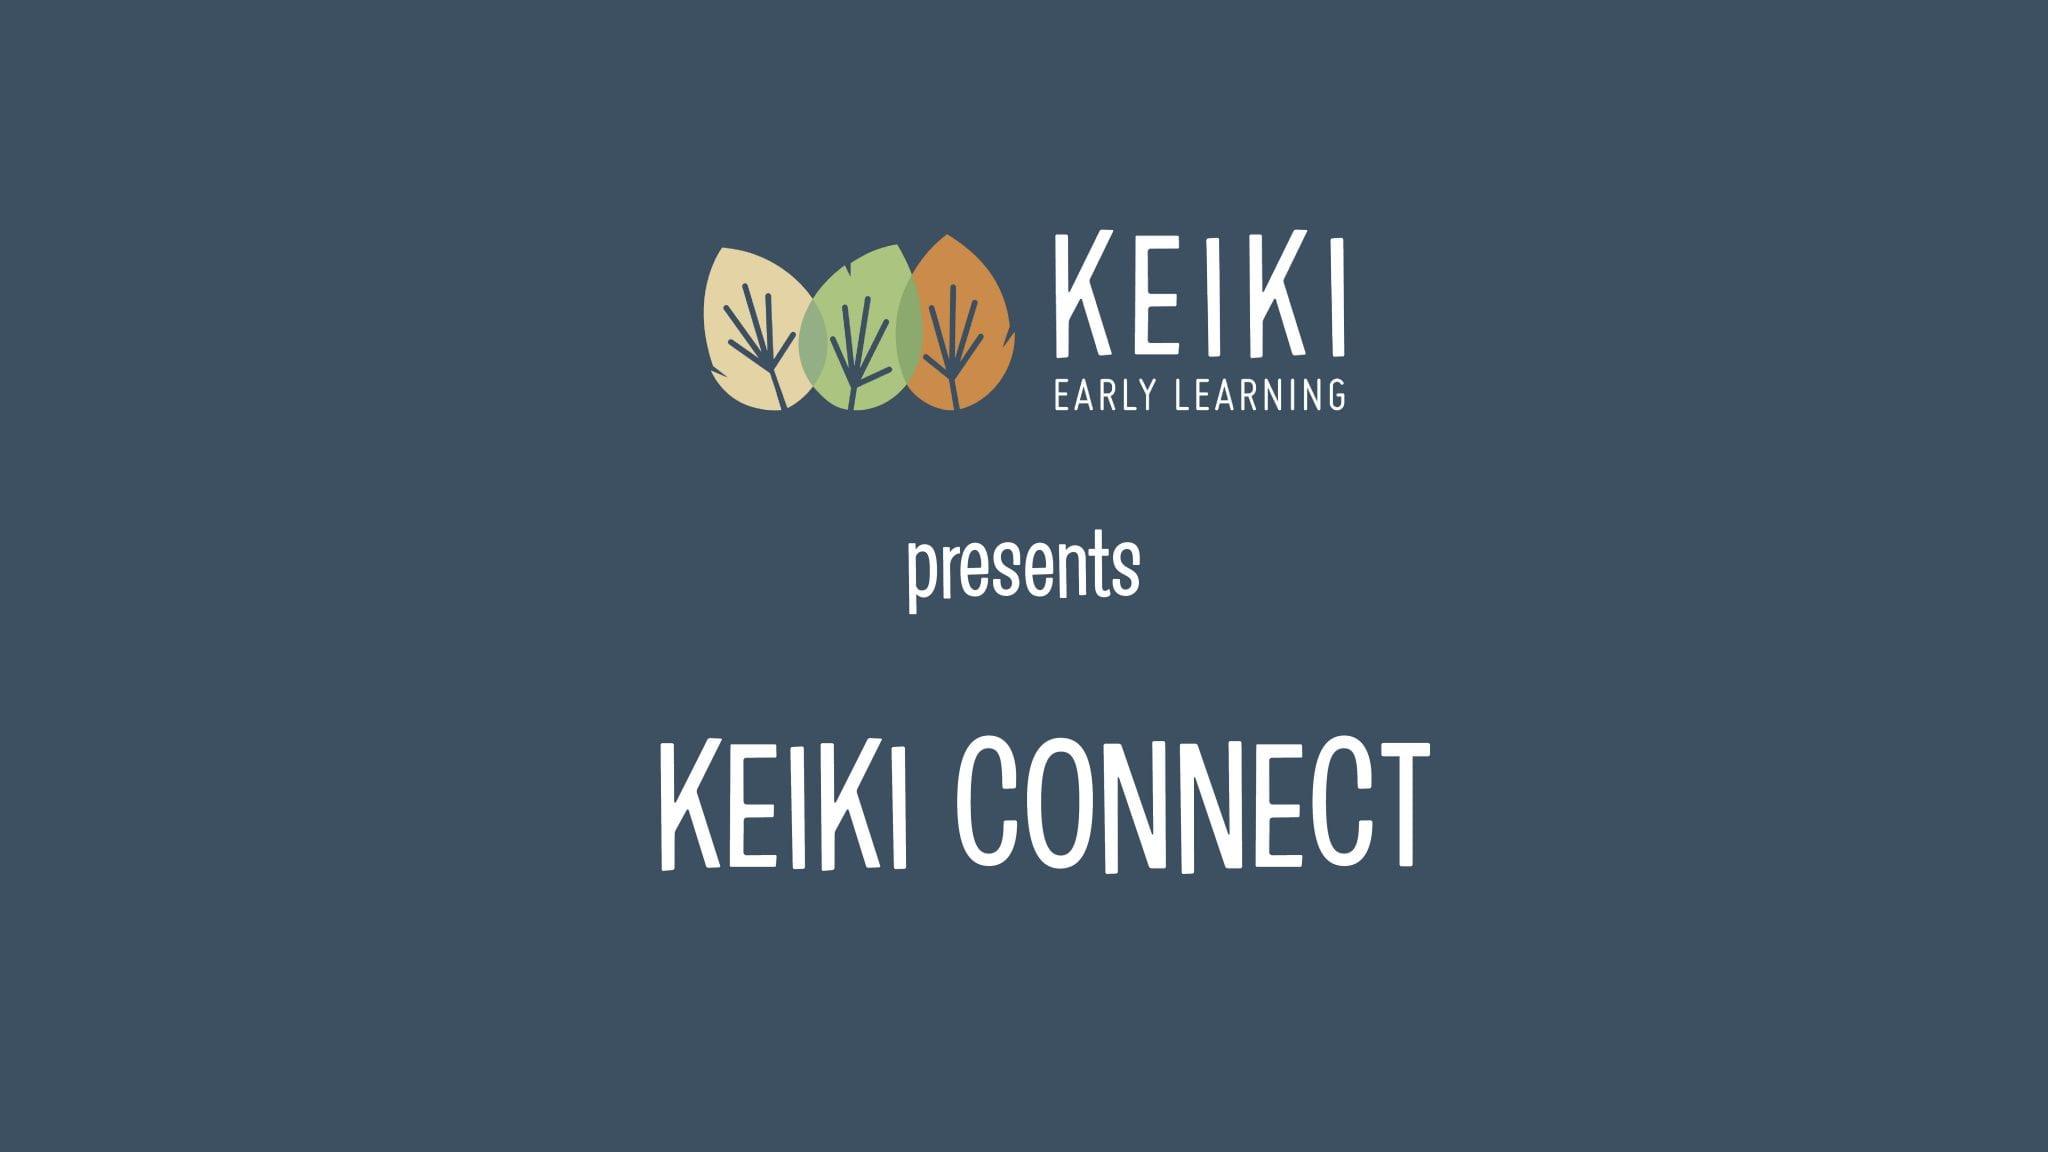 Keiki connect video start frame image